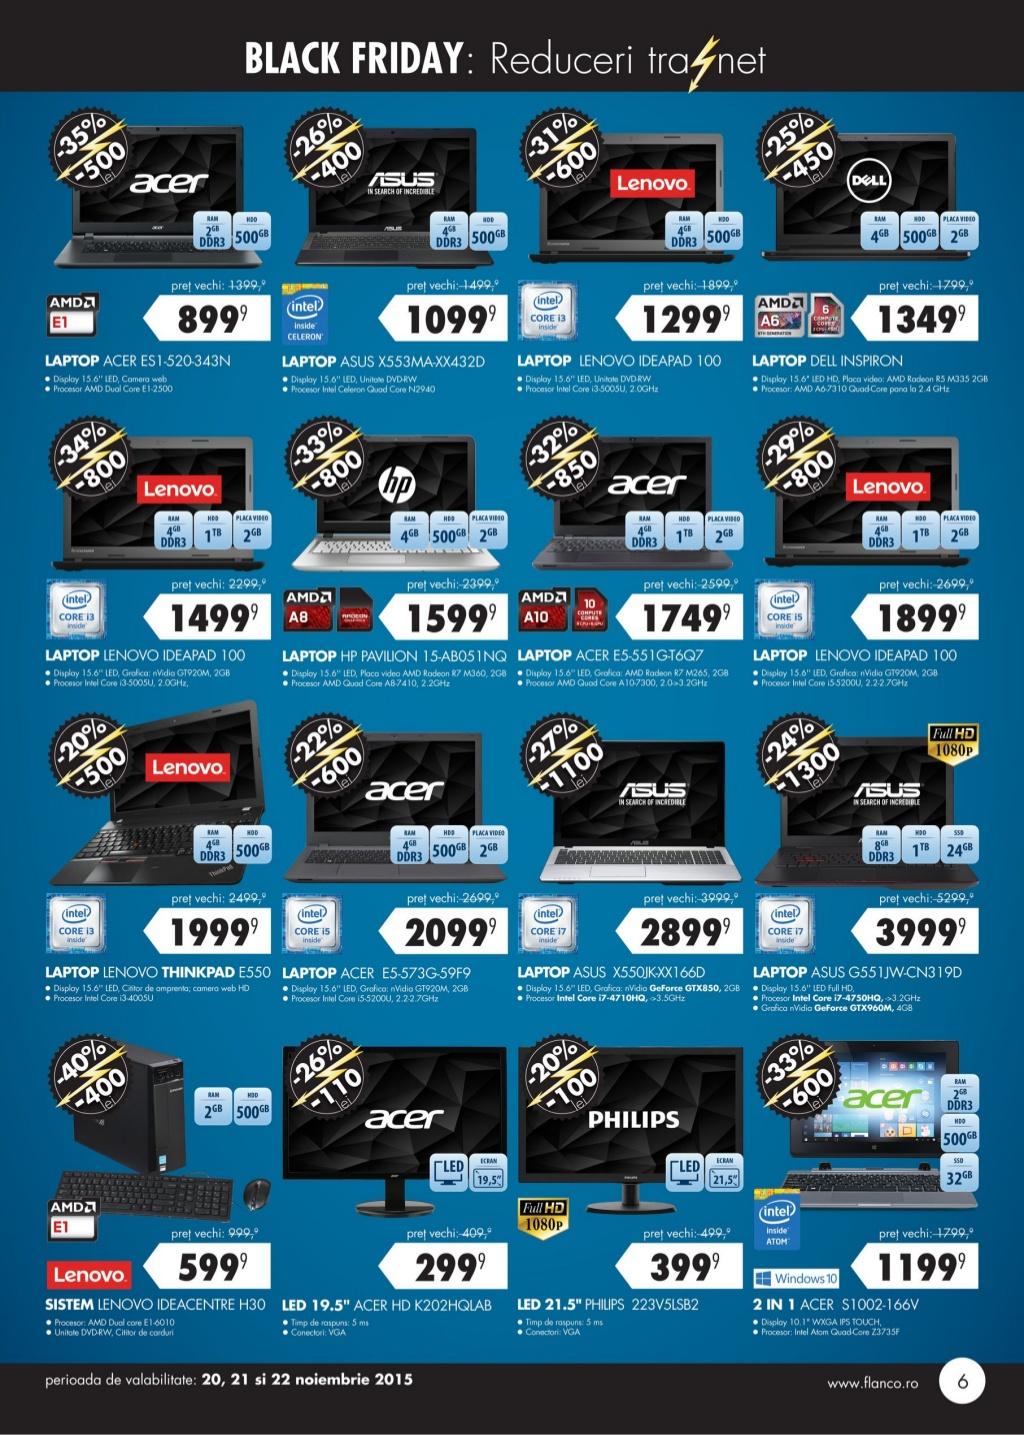 catalog-flanco-black-friday-2015-6-1024